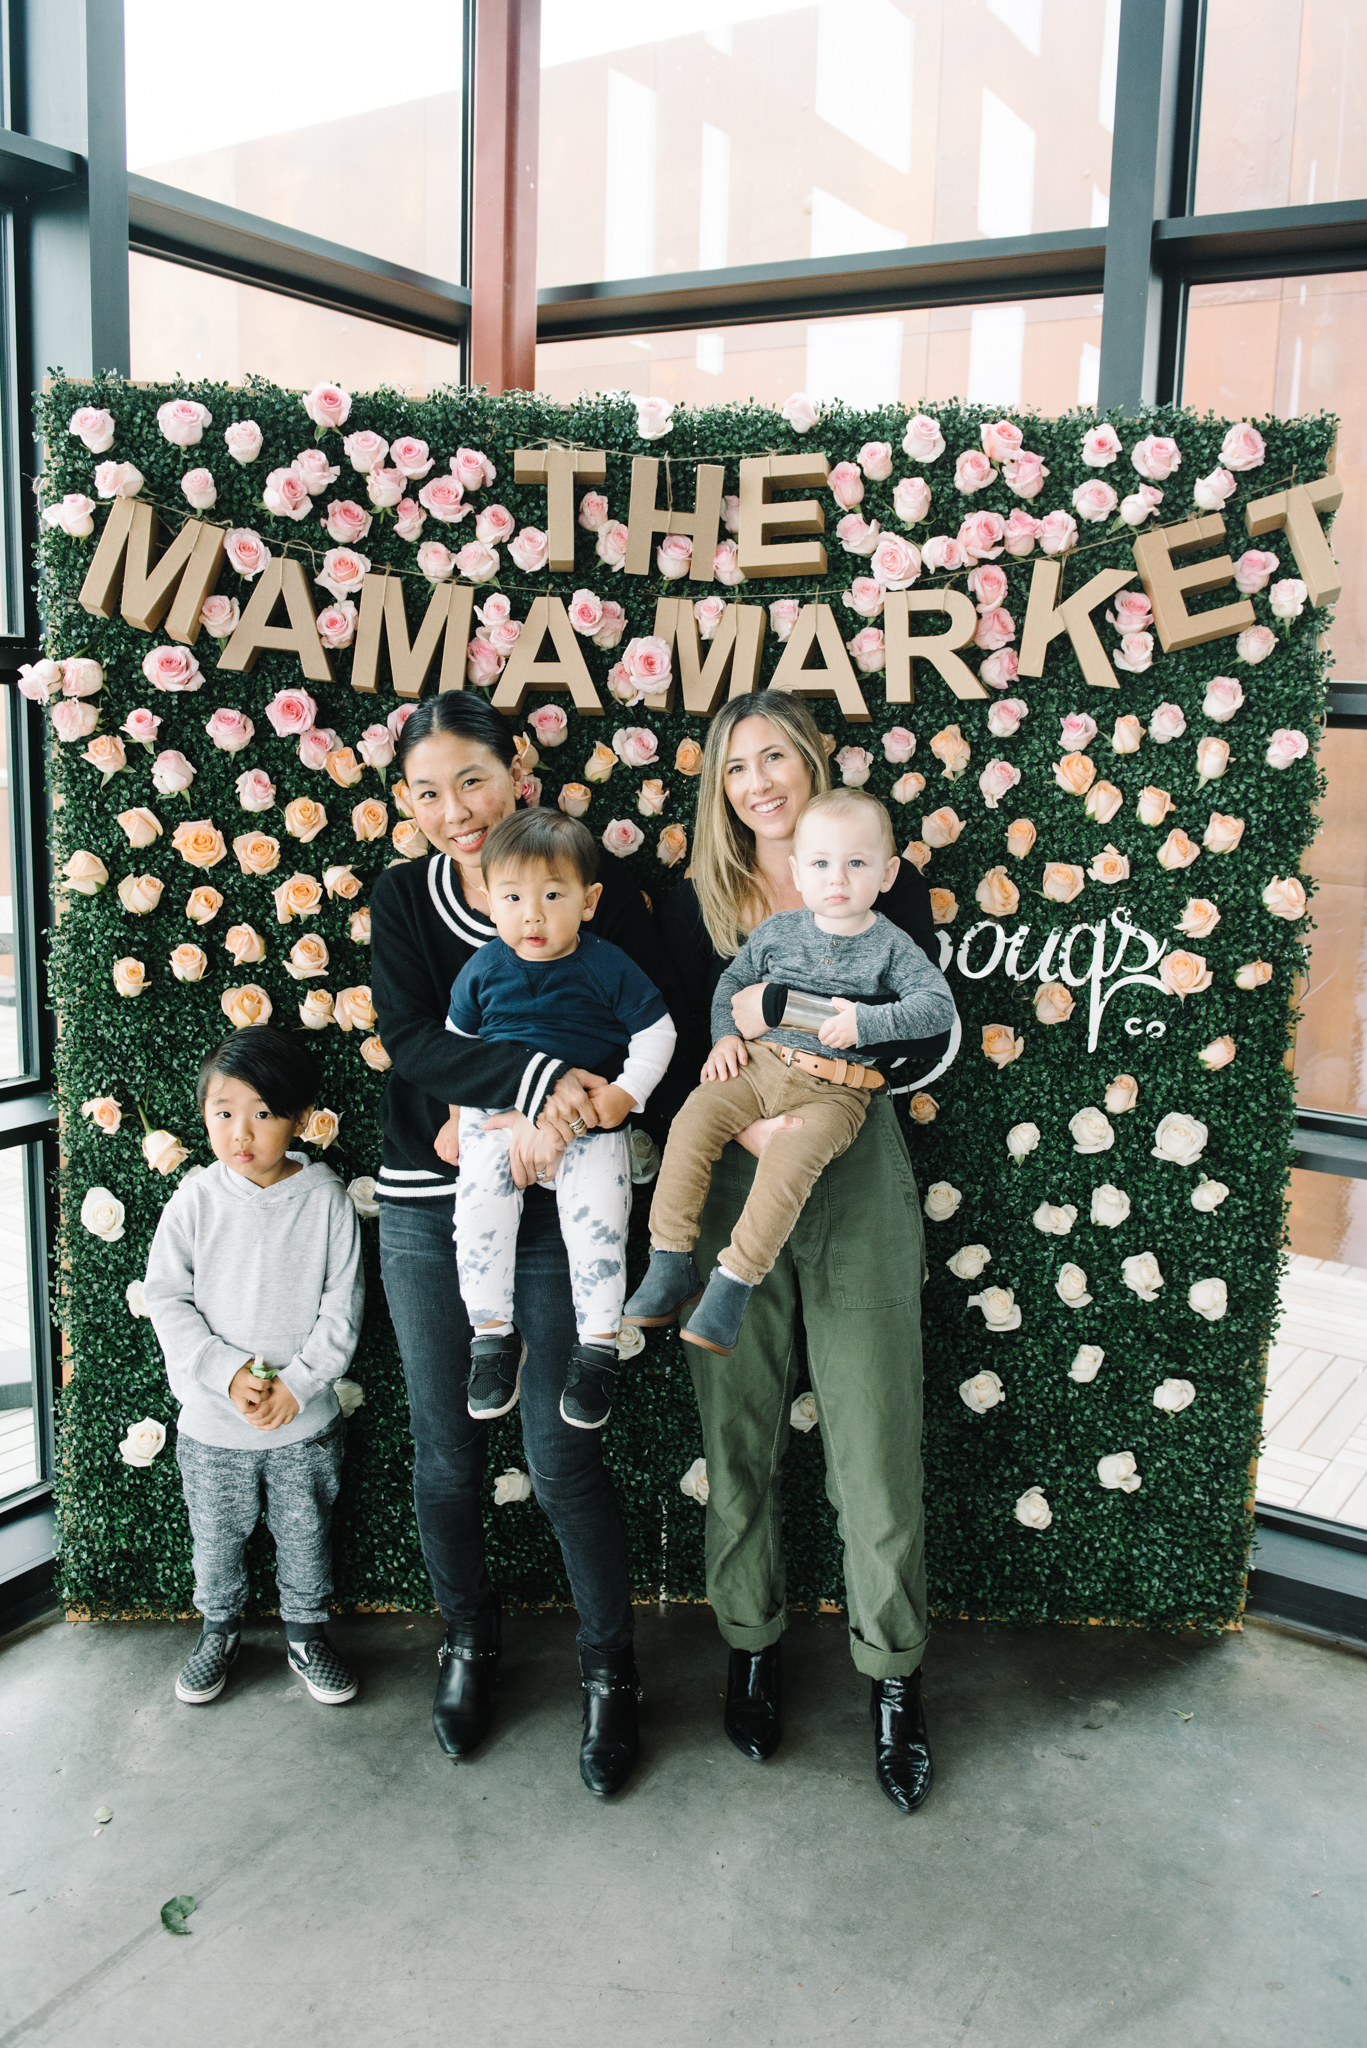 FMLA_MamaMarket-197.jpg